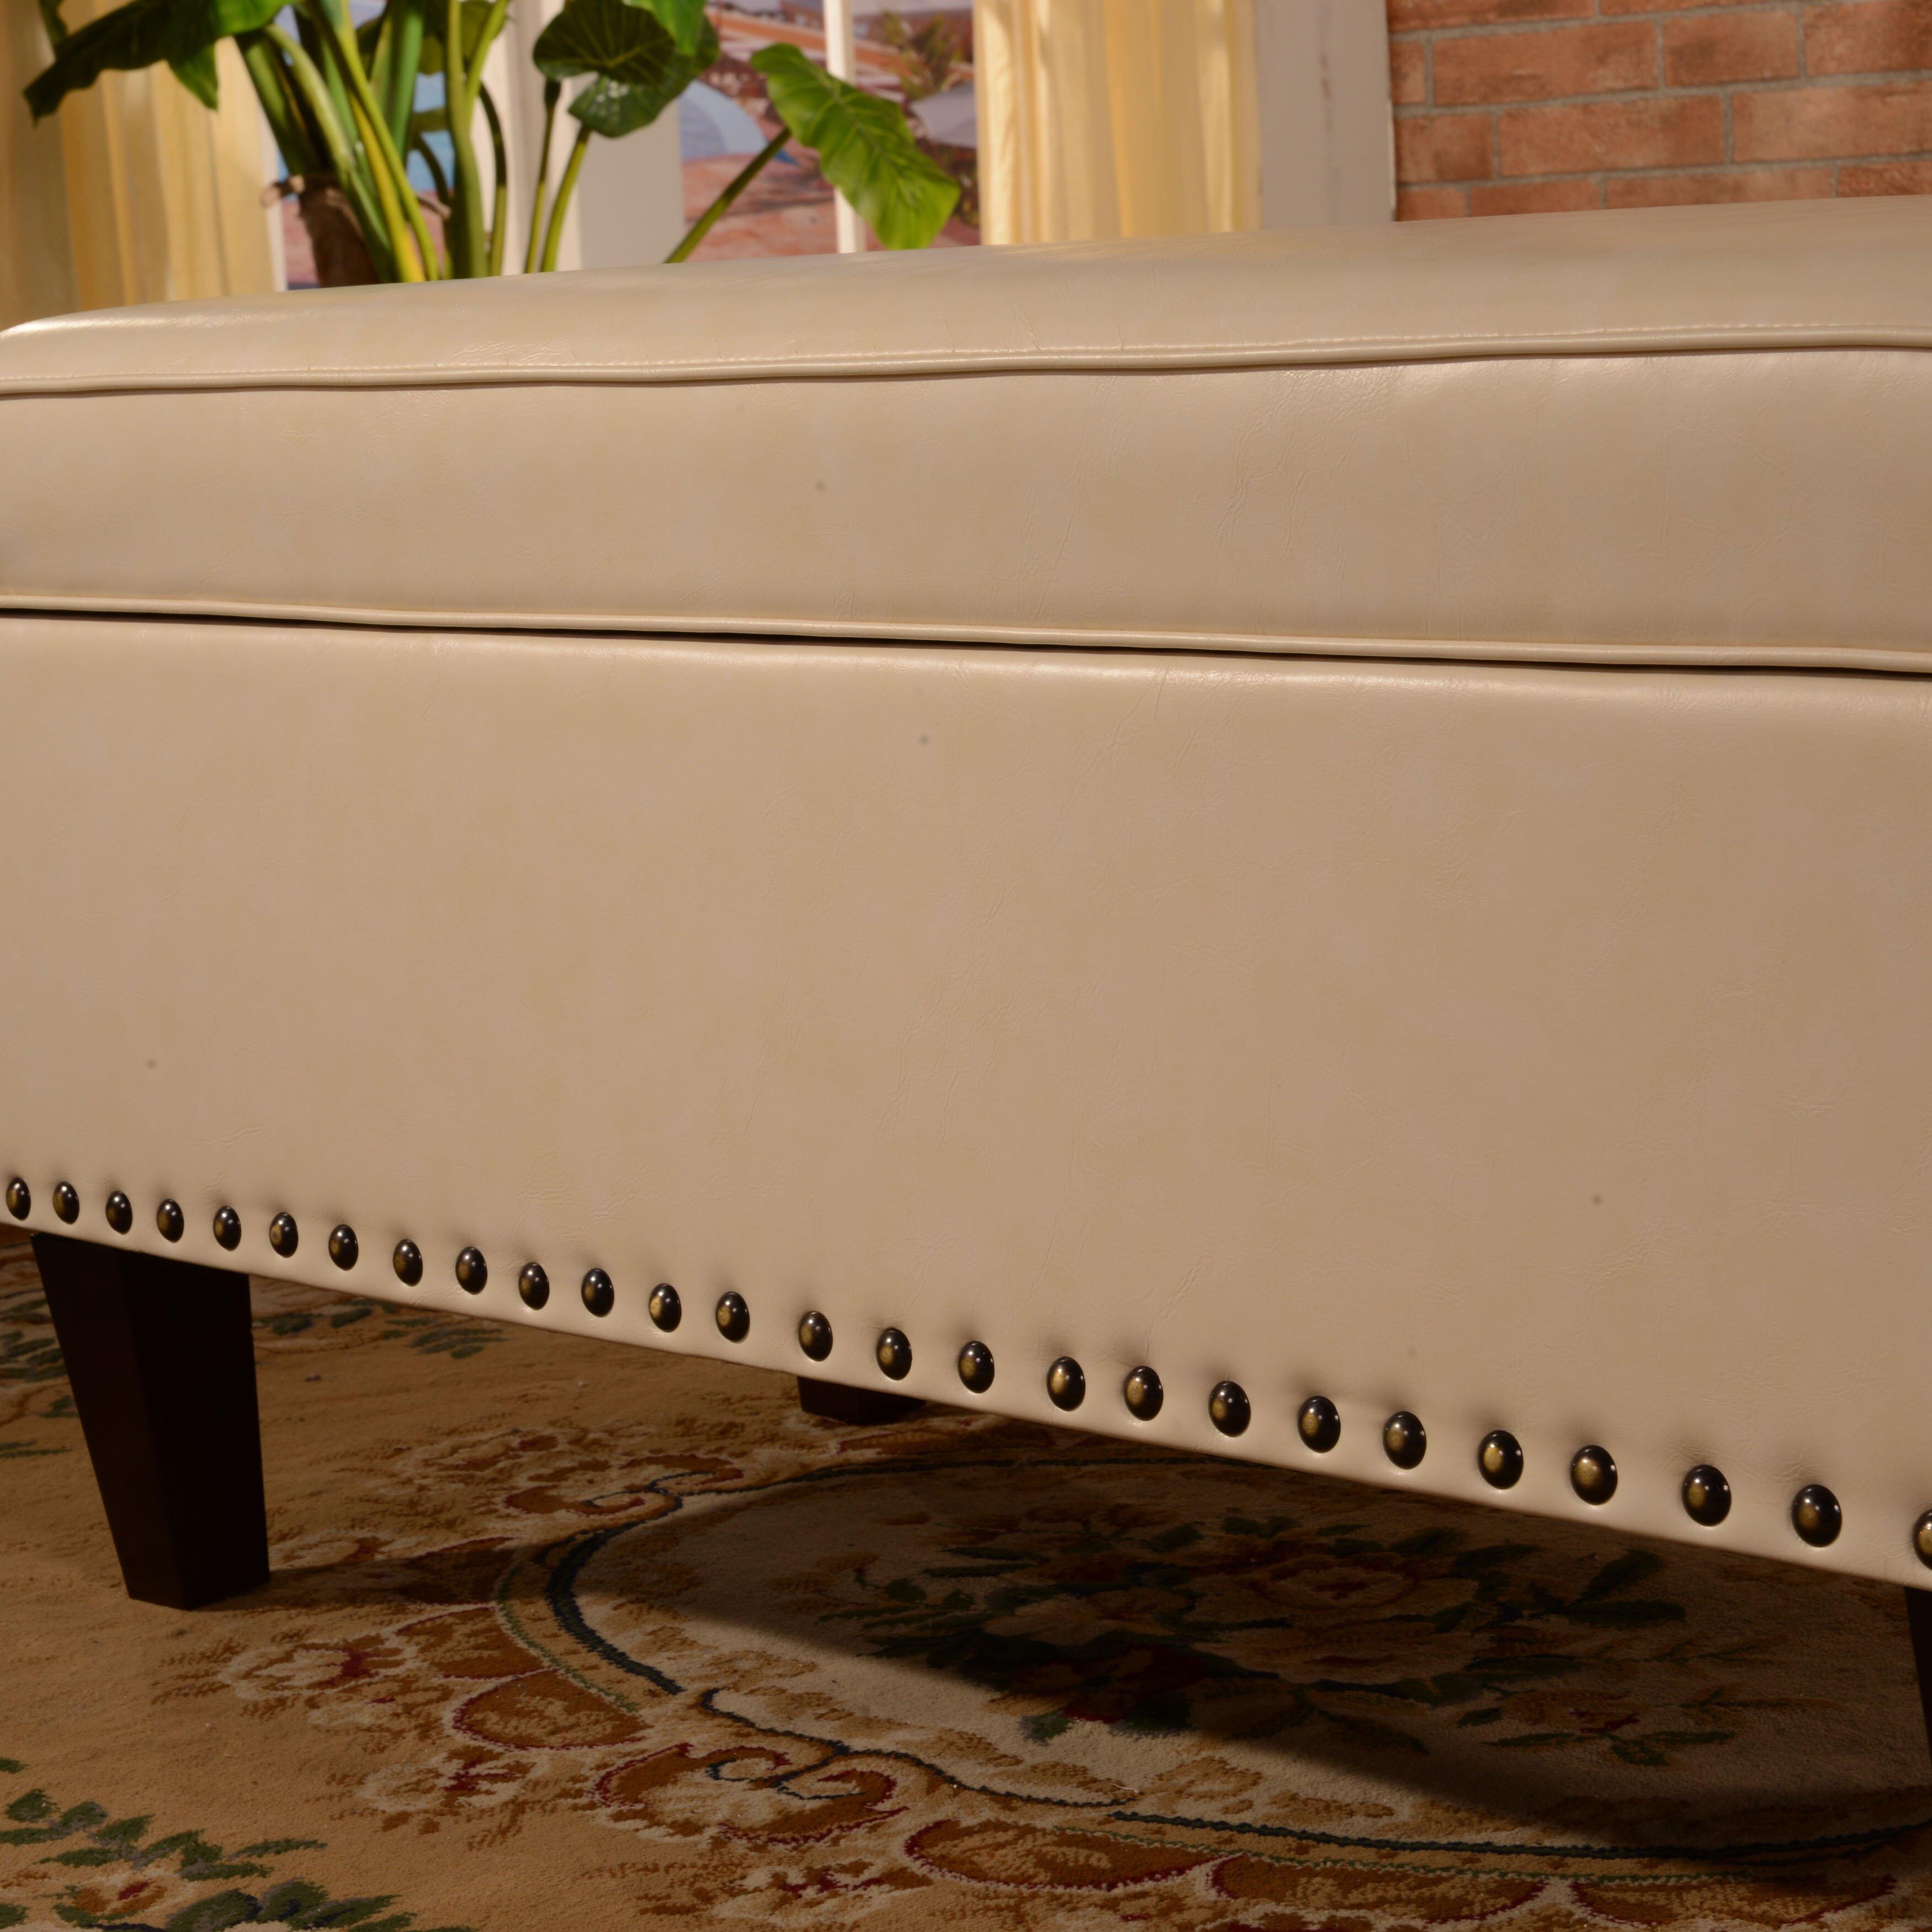 Noya Usa Castilian Upholstered Storage Bedroom Bench: Storage Bedroom Bench